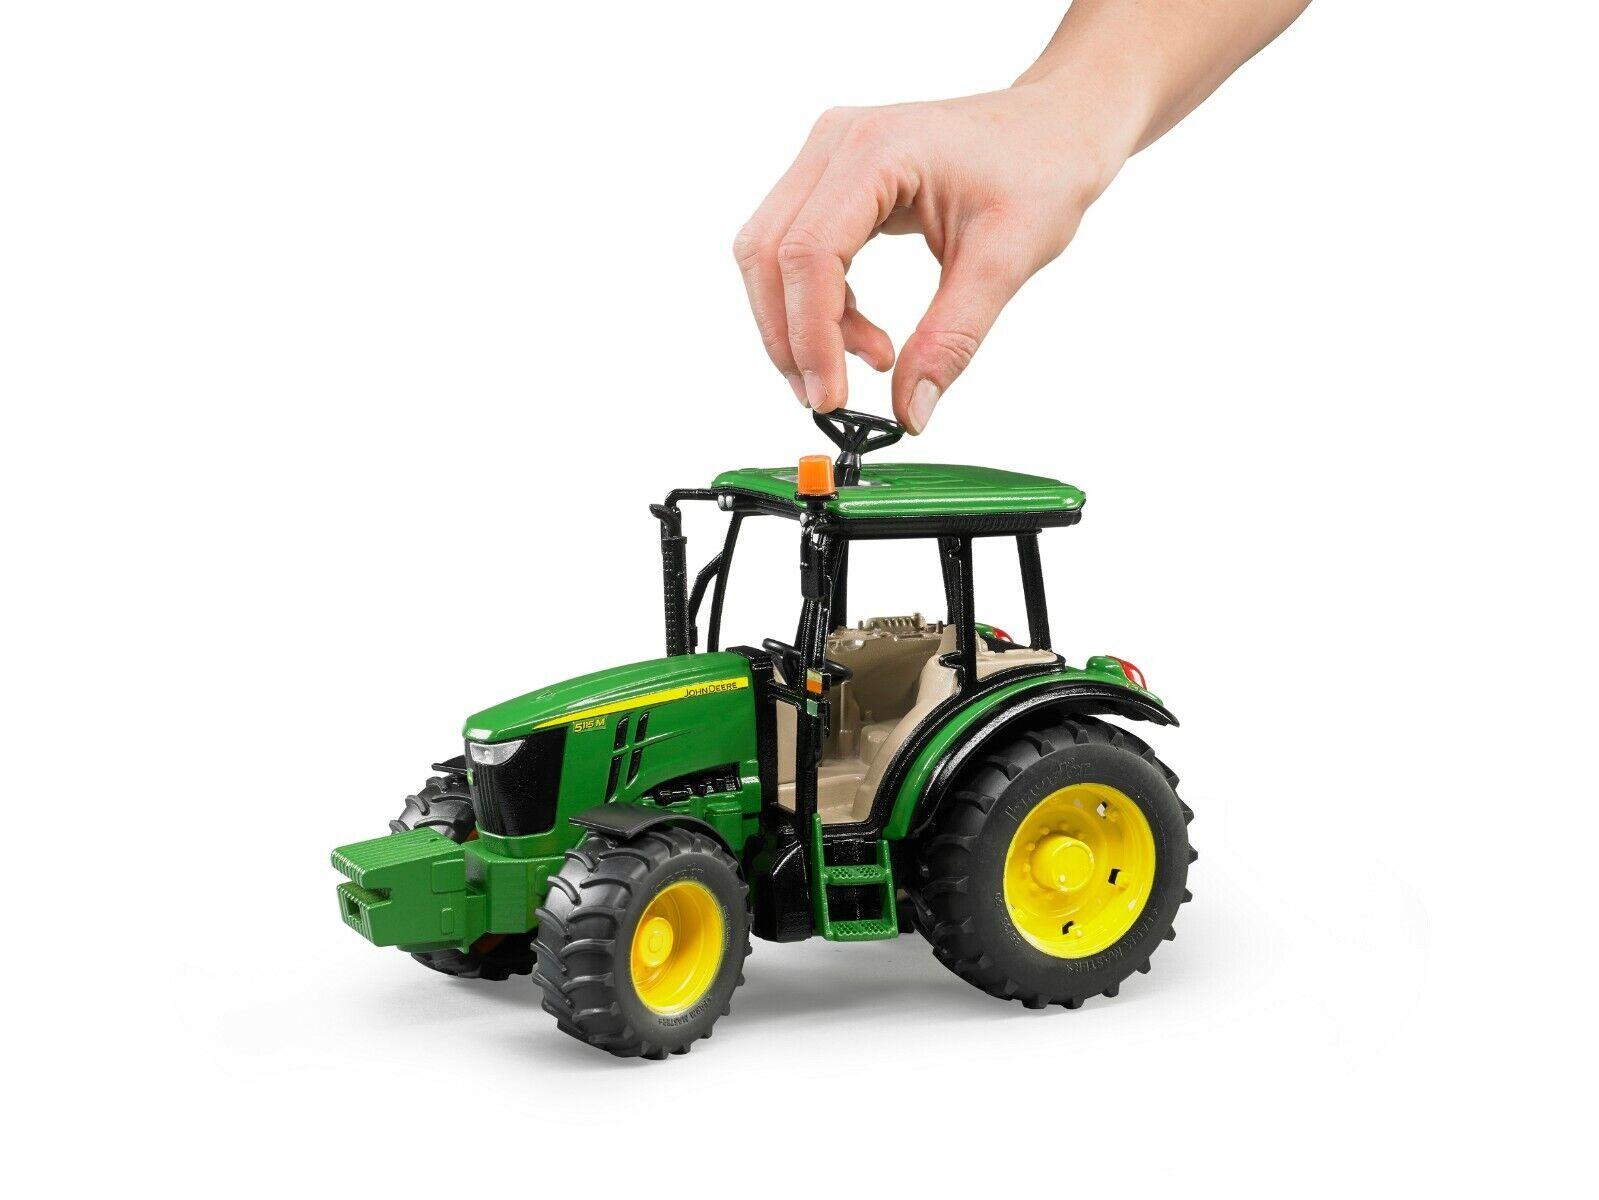 Bruder 02106 John Deere 5115 M Traktor, Schlepper, Trecker 2106 Neu